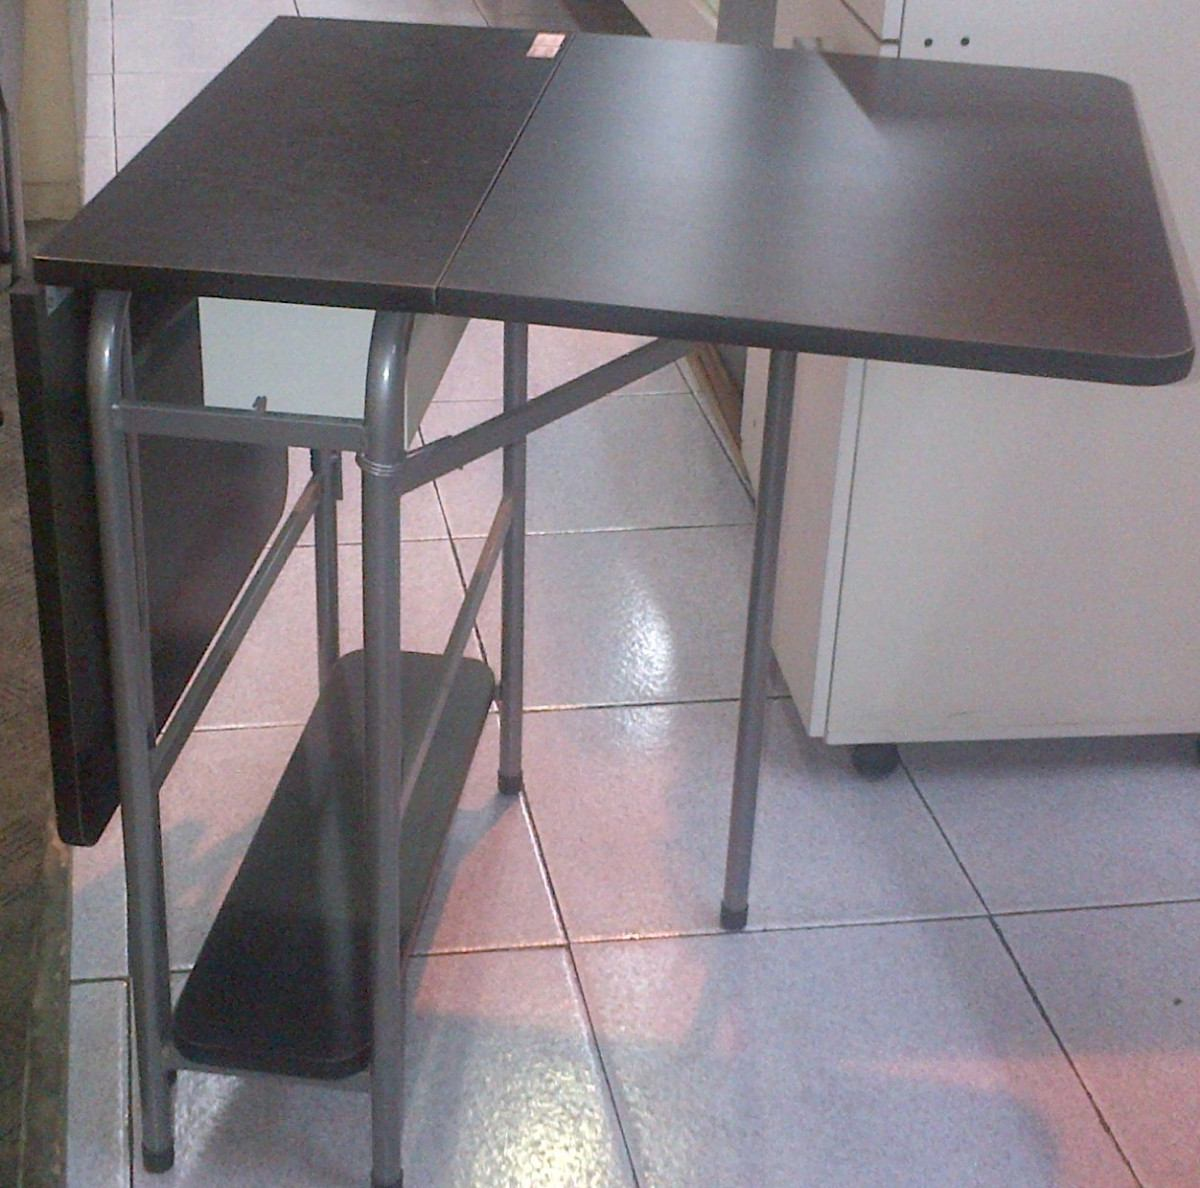 Mini Mesa Plegable Para Todo Uso En Tu Casa 1 179 99 En  # Lejaim Muebles De Cocina